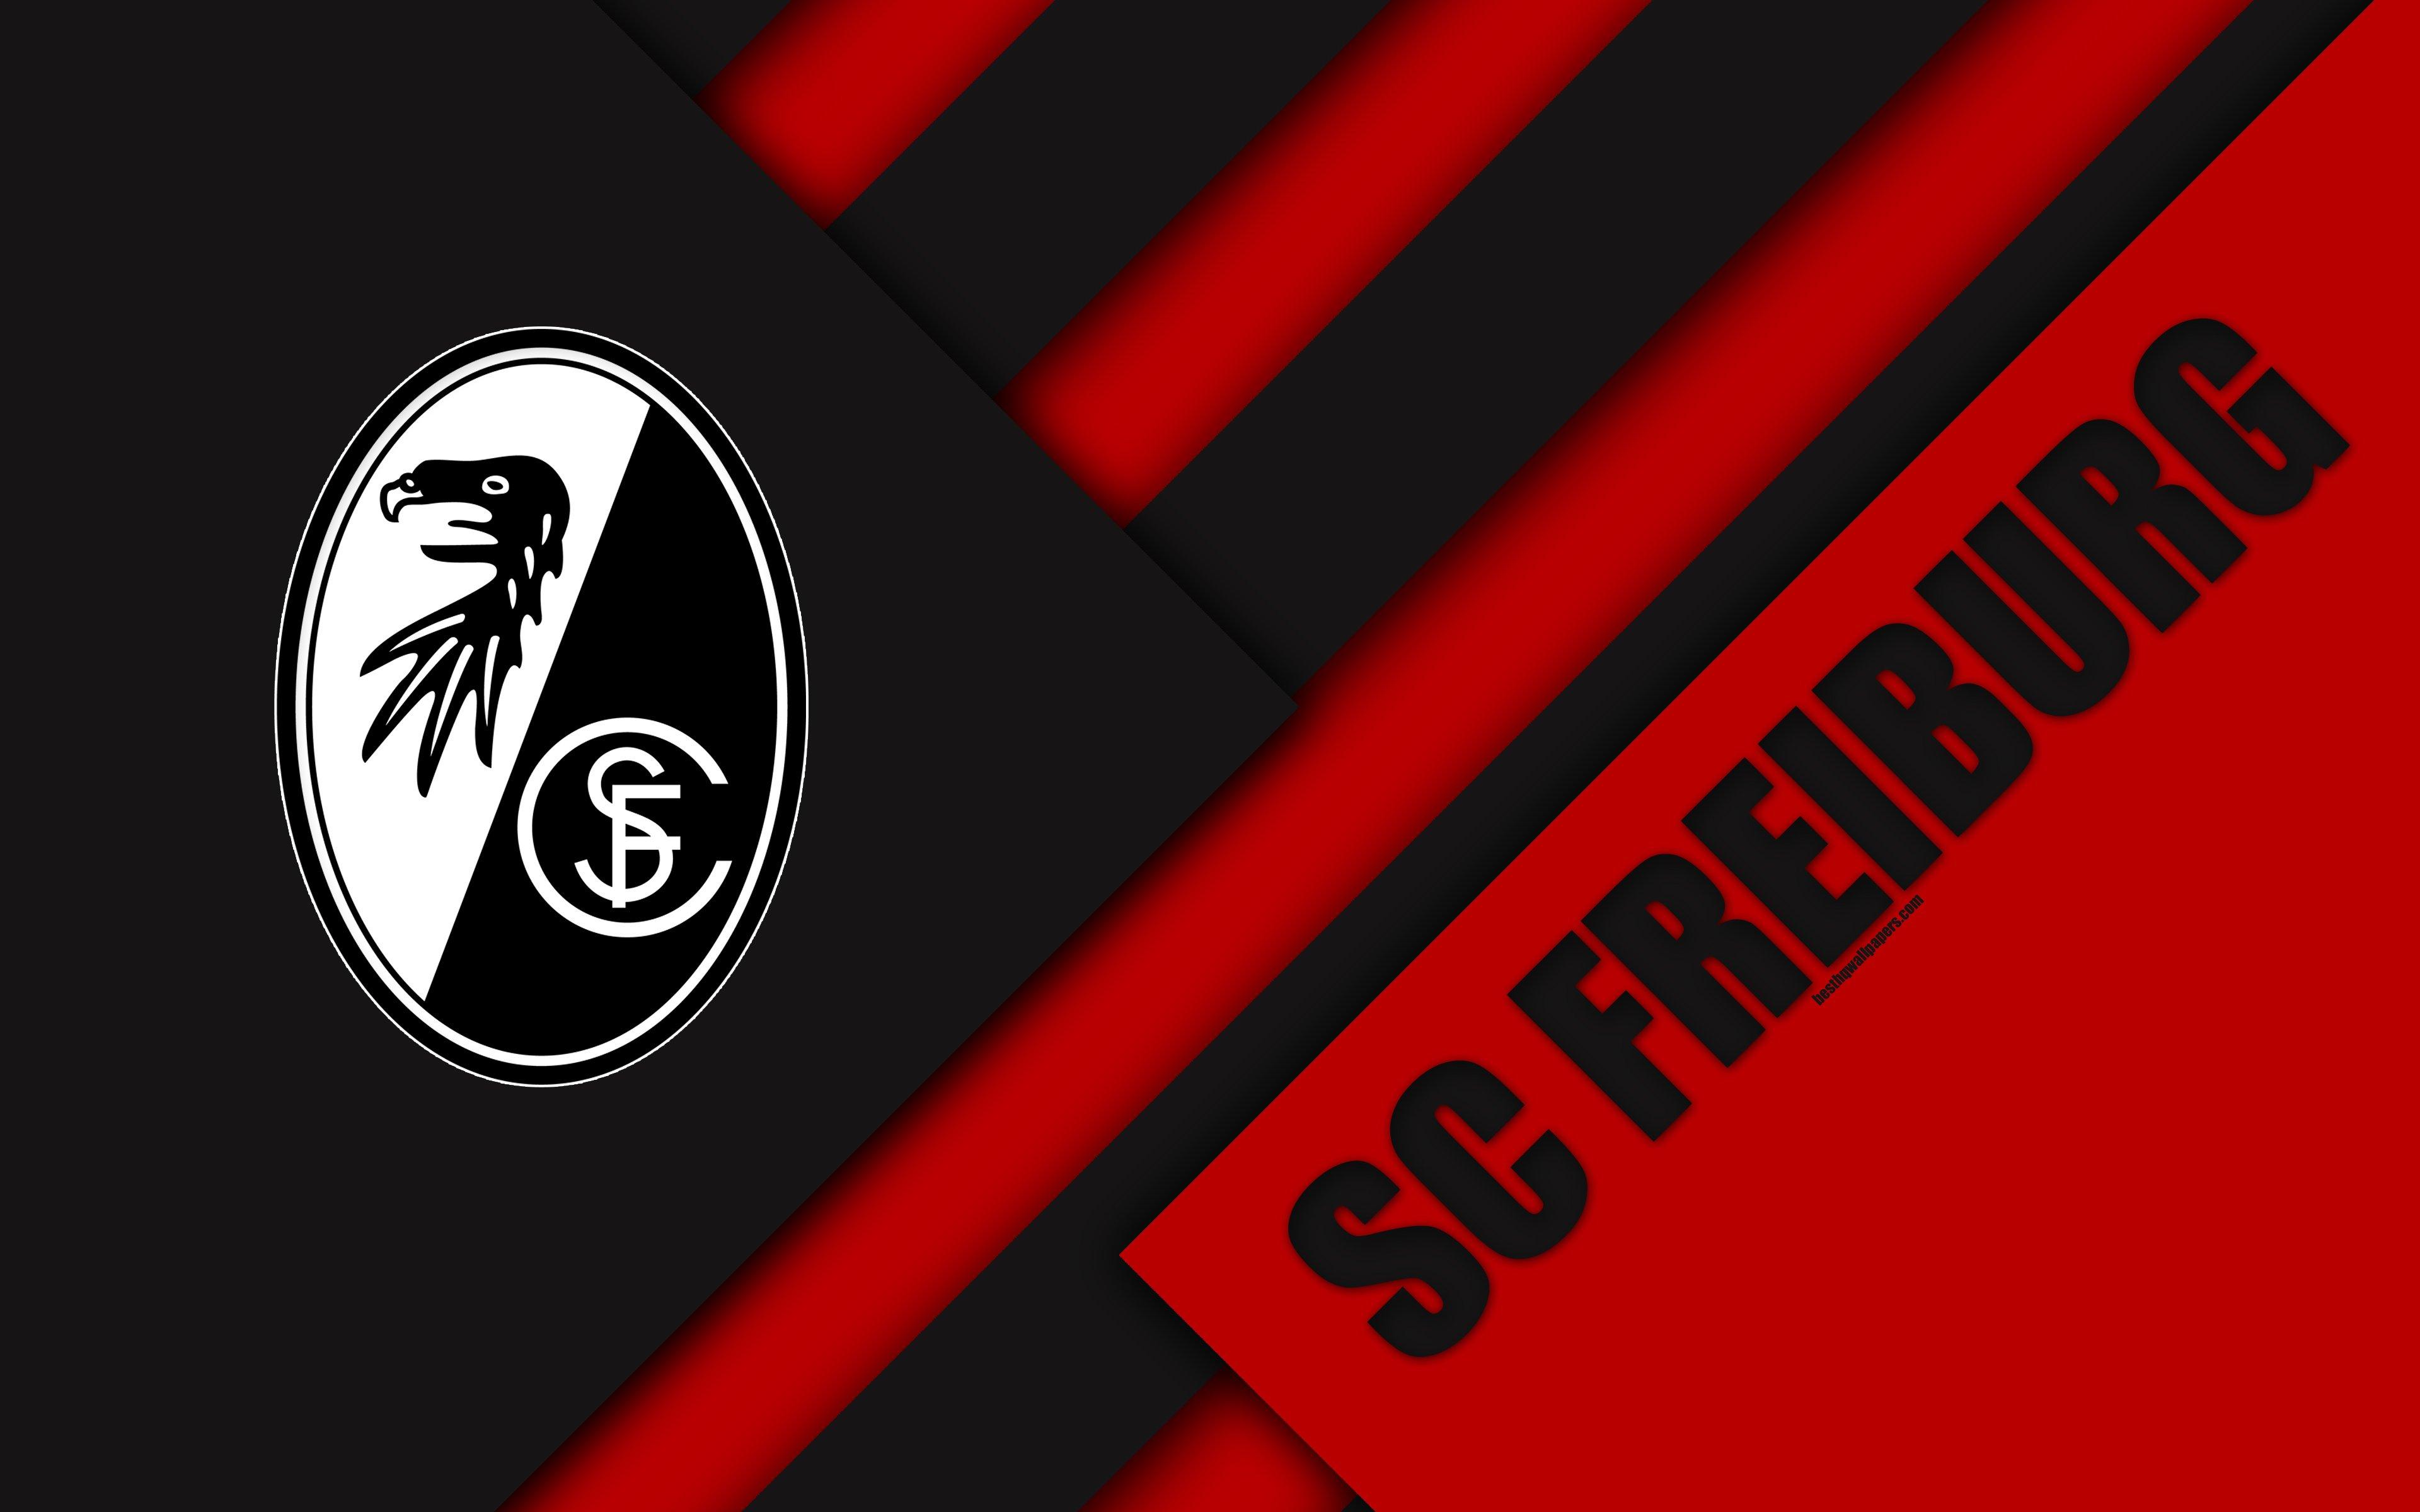 Download wallpapers SC Freiburg 4k material design emblem 3840x2400